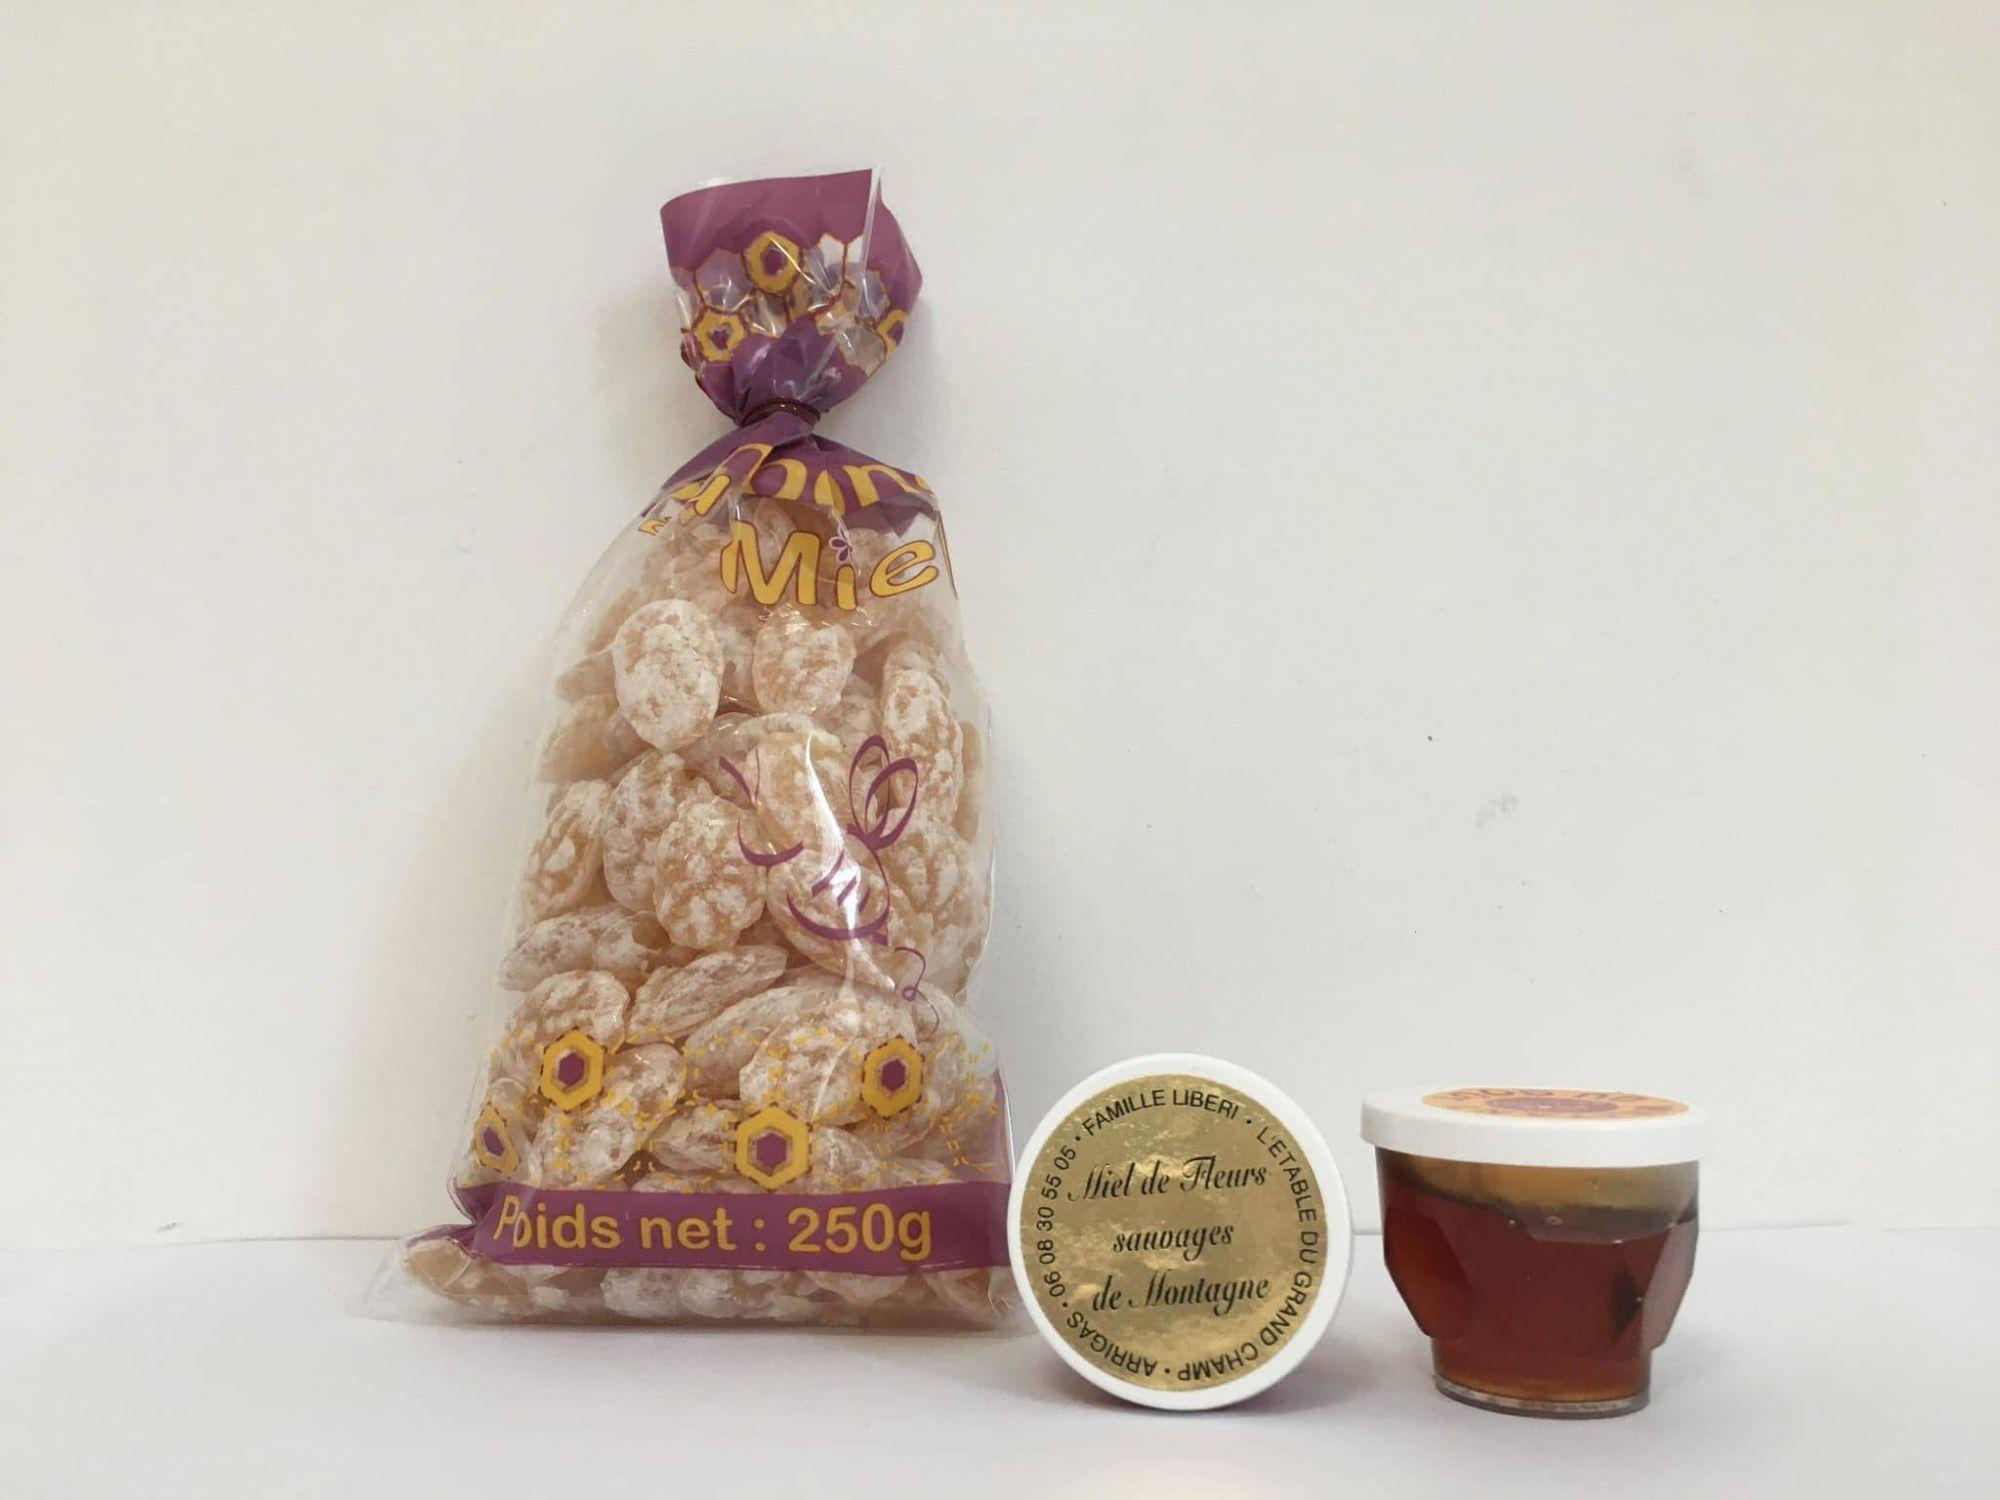 Miels + bonbons - Famille Liberi